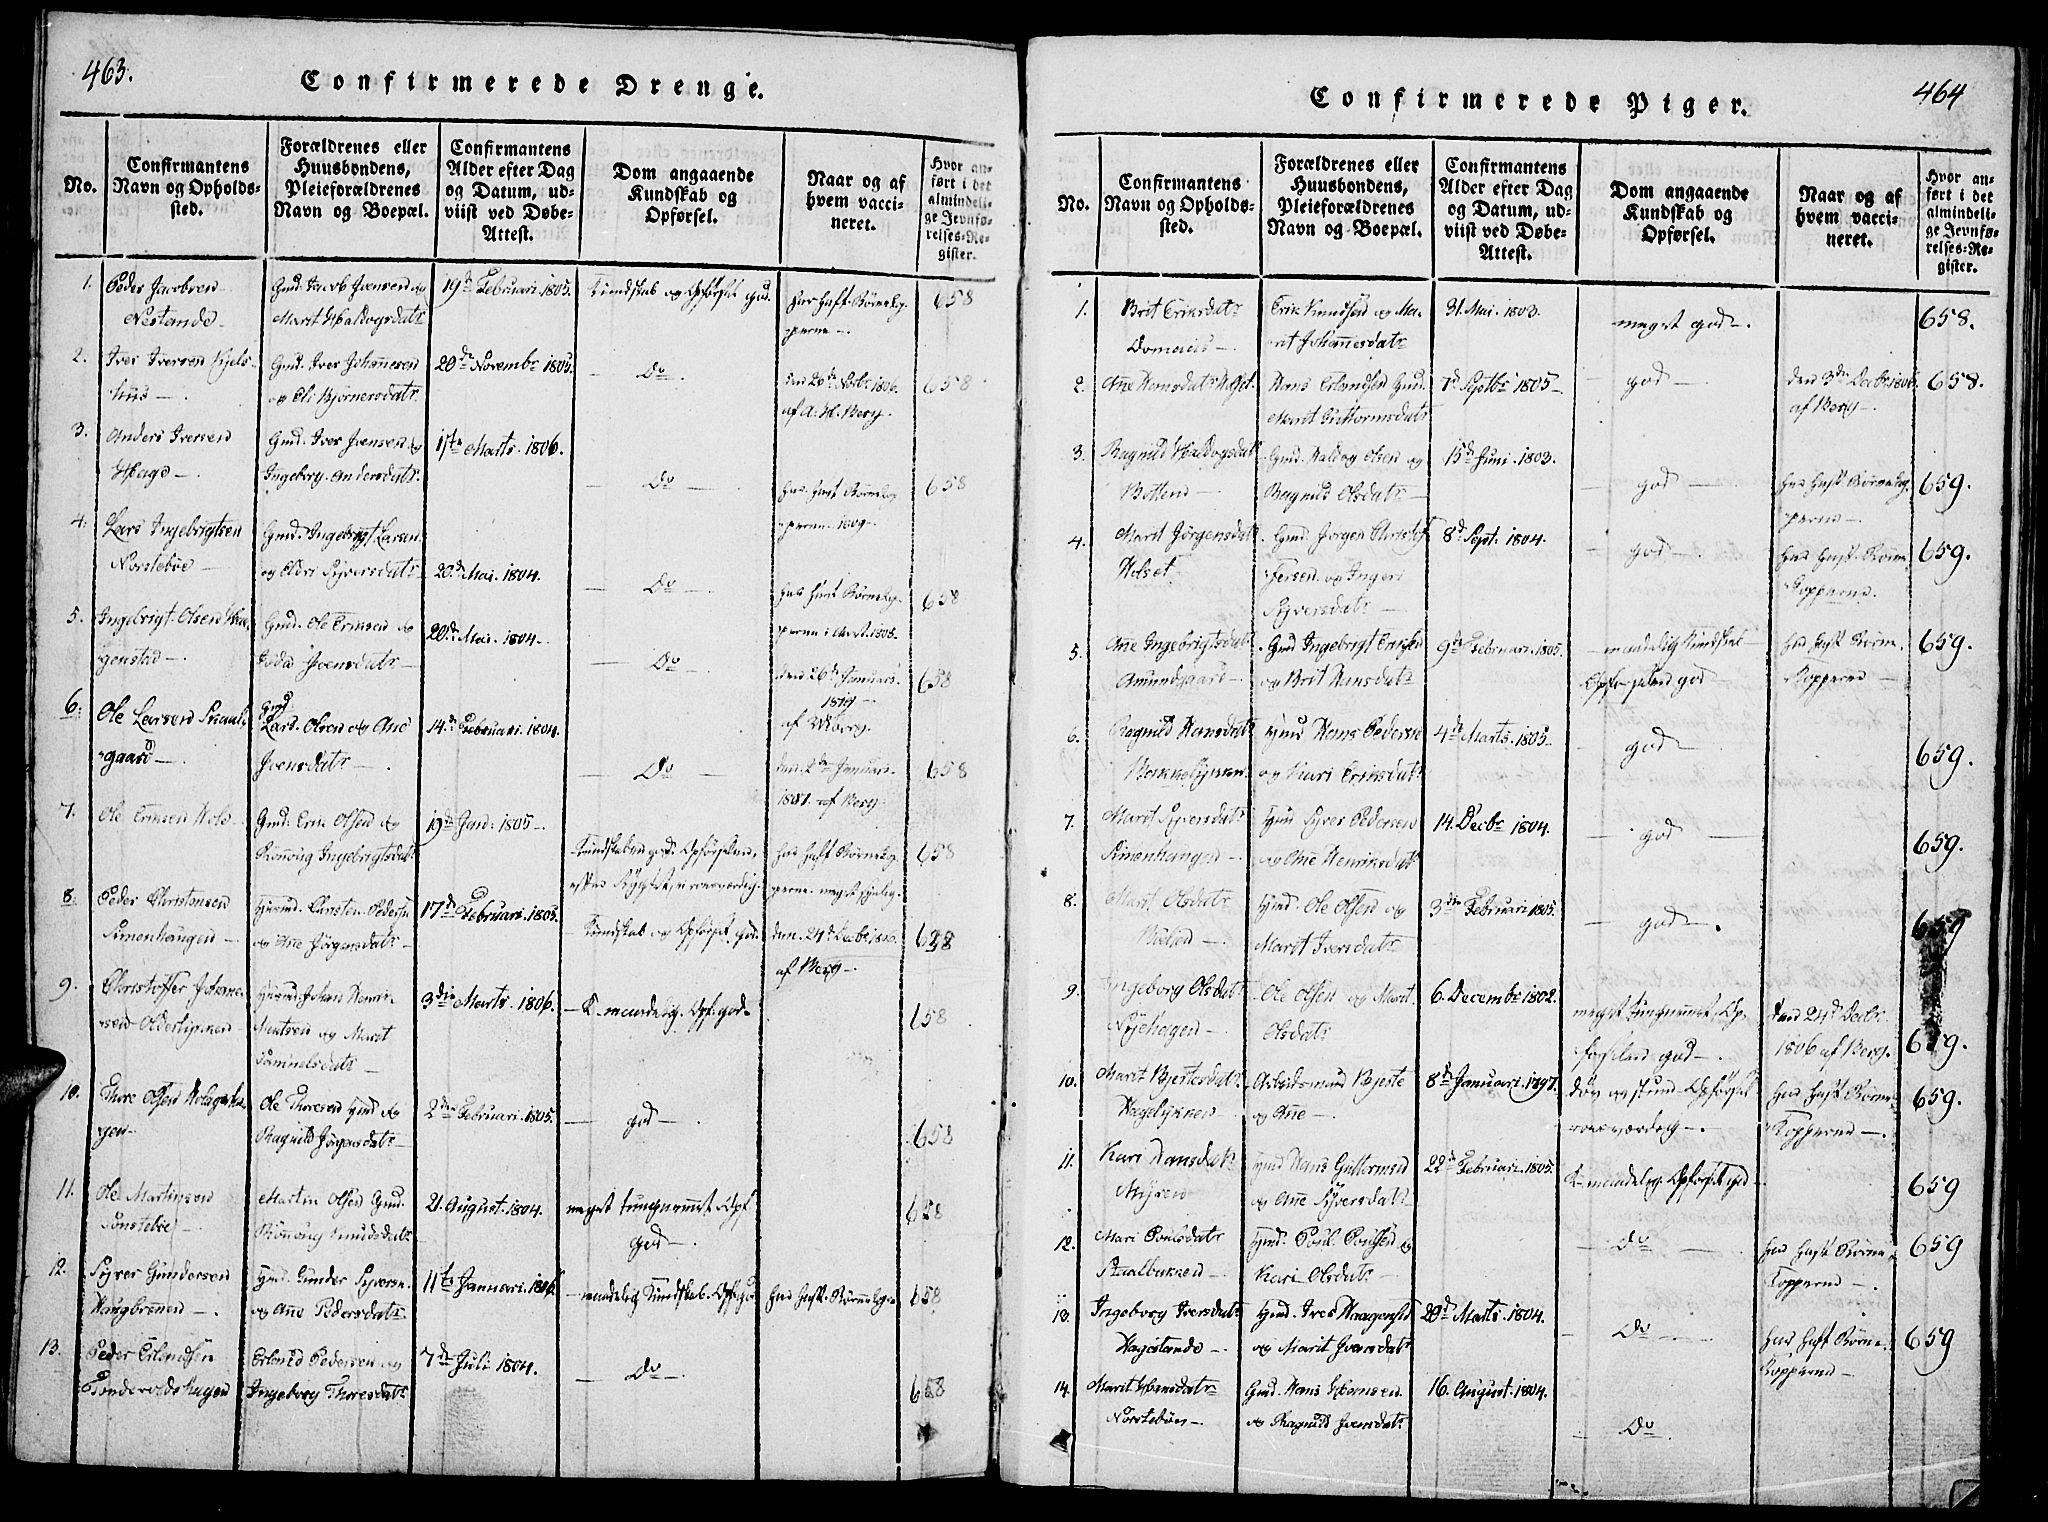 SAH, Lesja prestekontor, Ministerialbok nr. 4, 1820-1829, s. 463-464